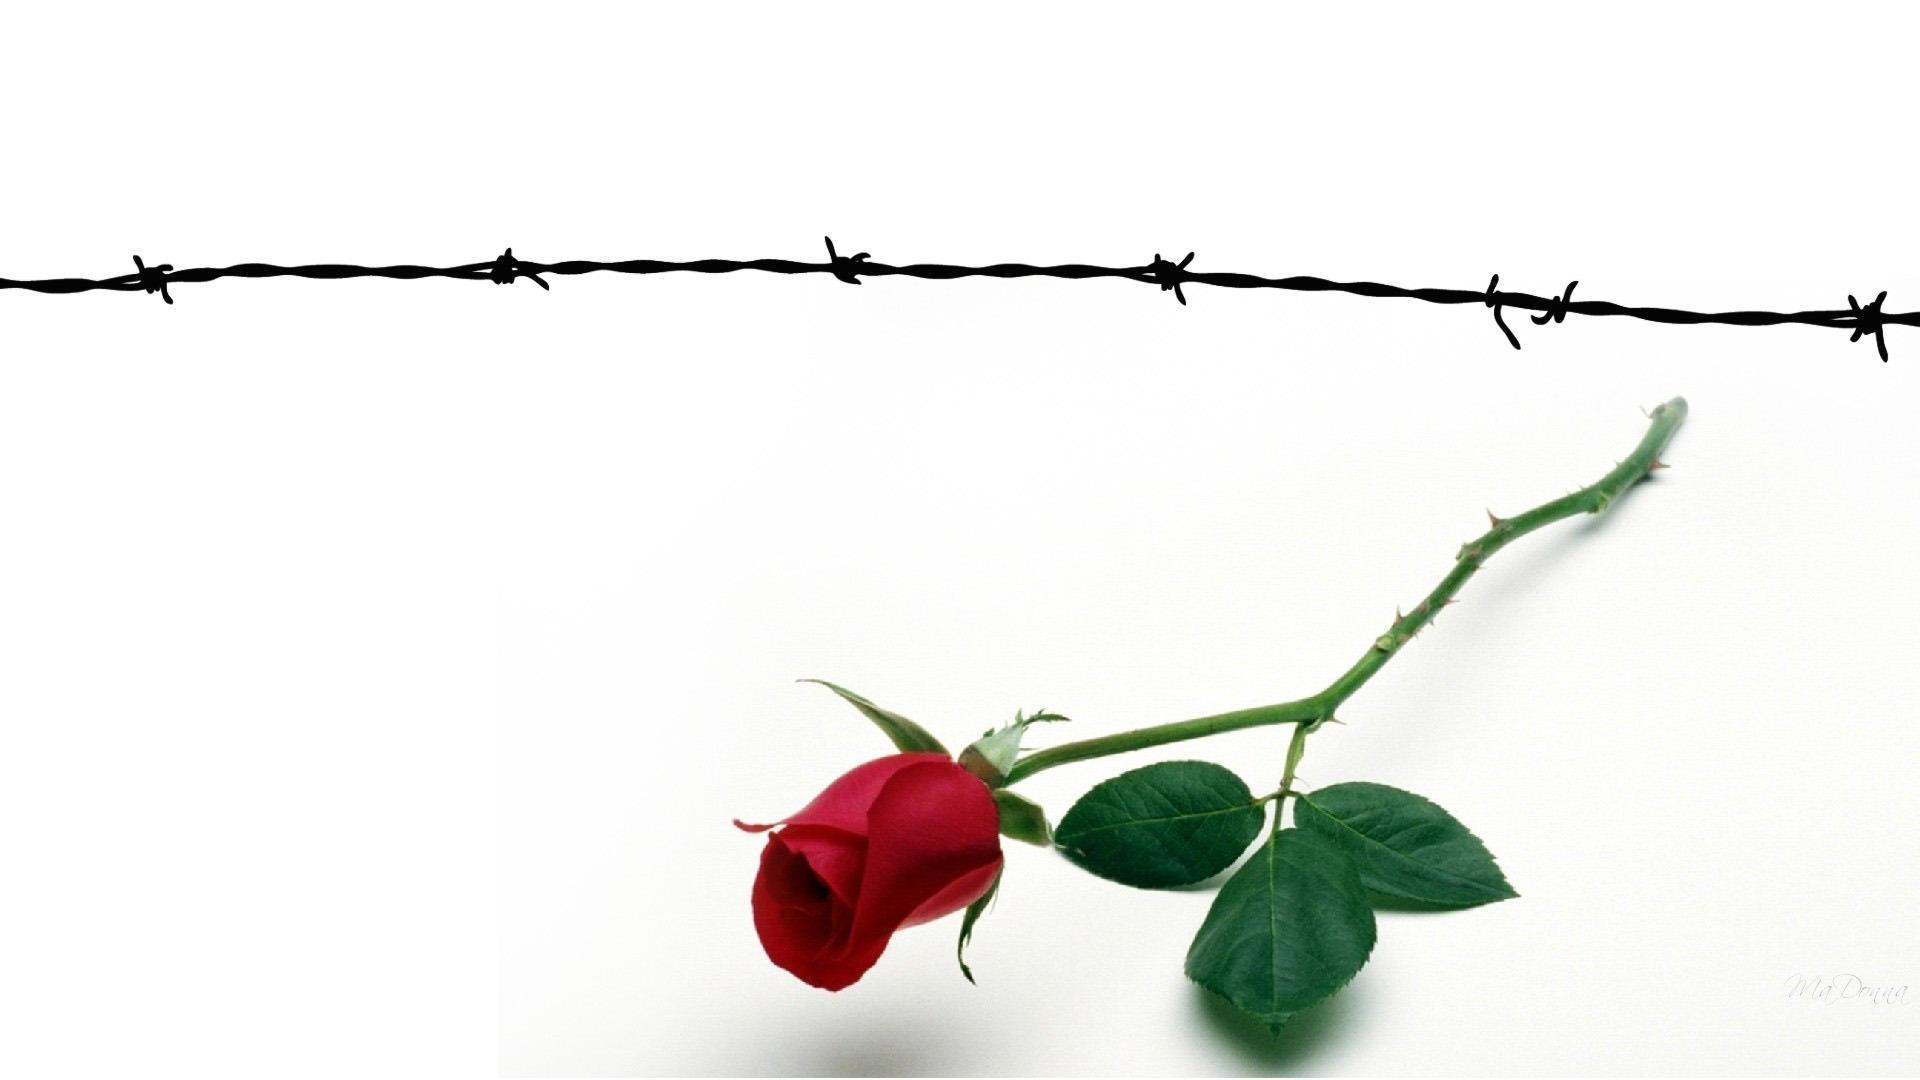 Роза за колючей проволокой фото тату